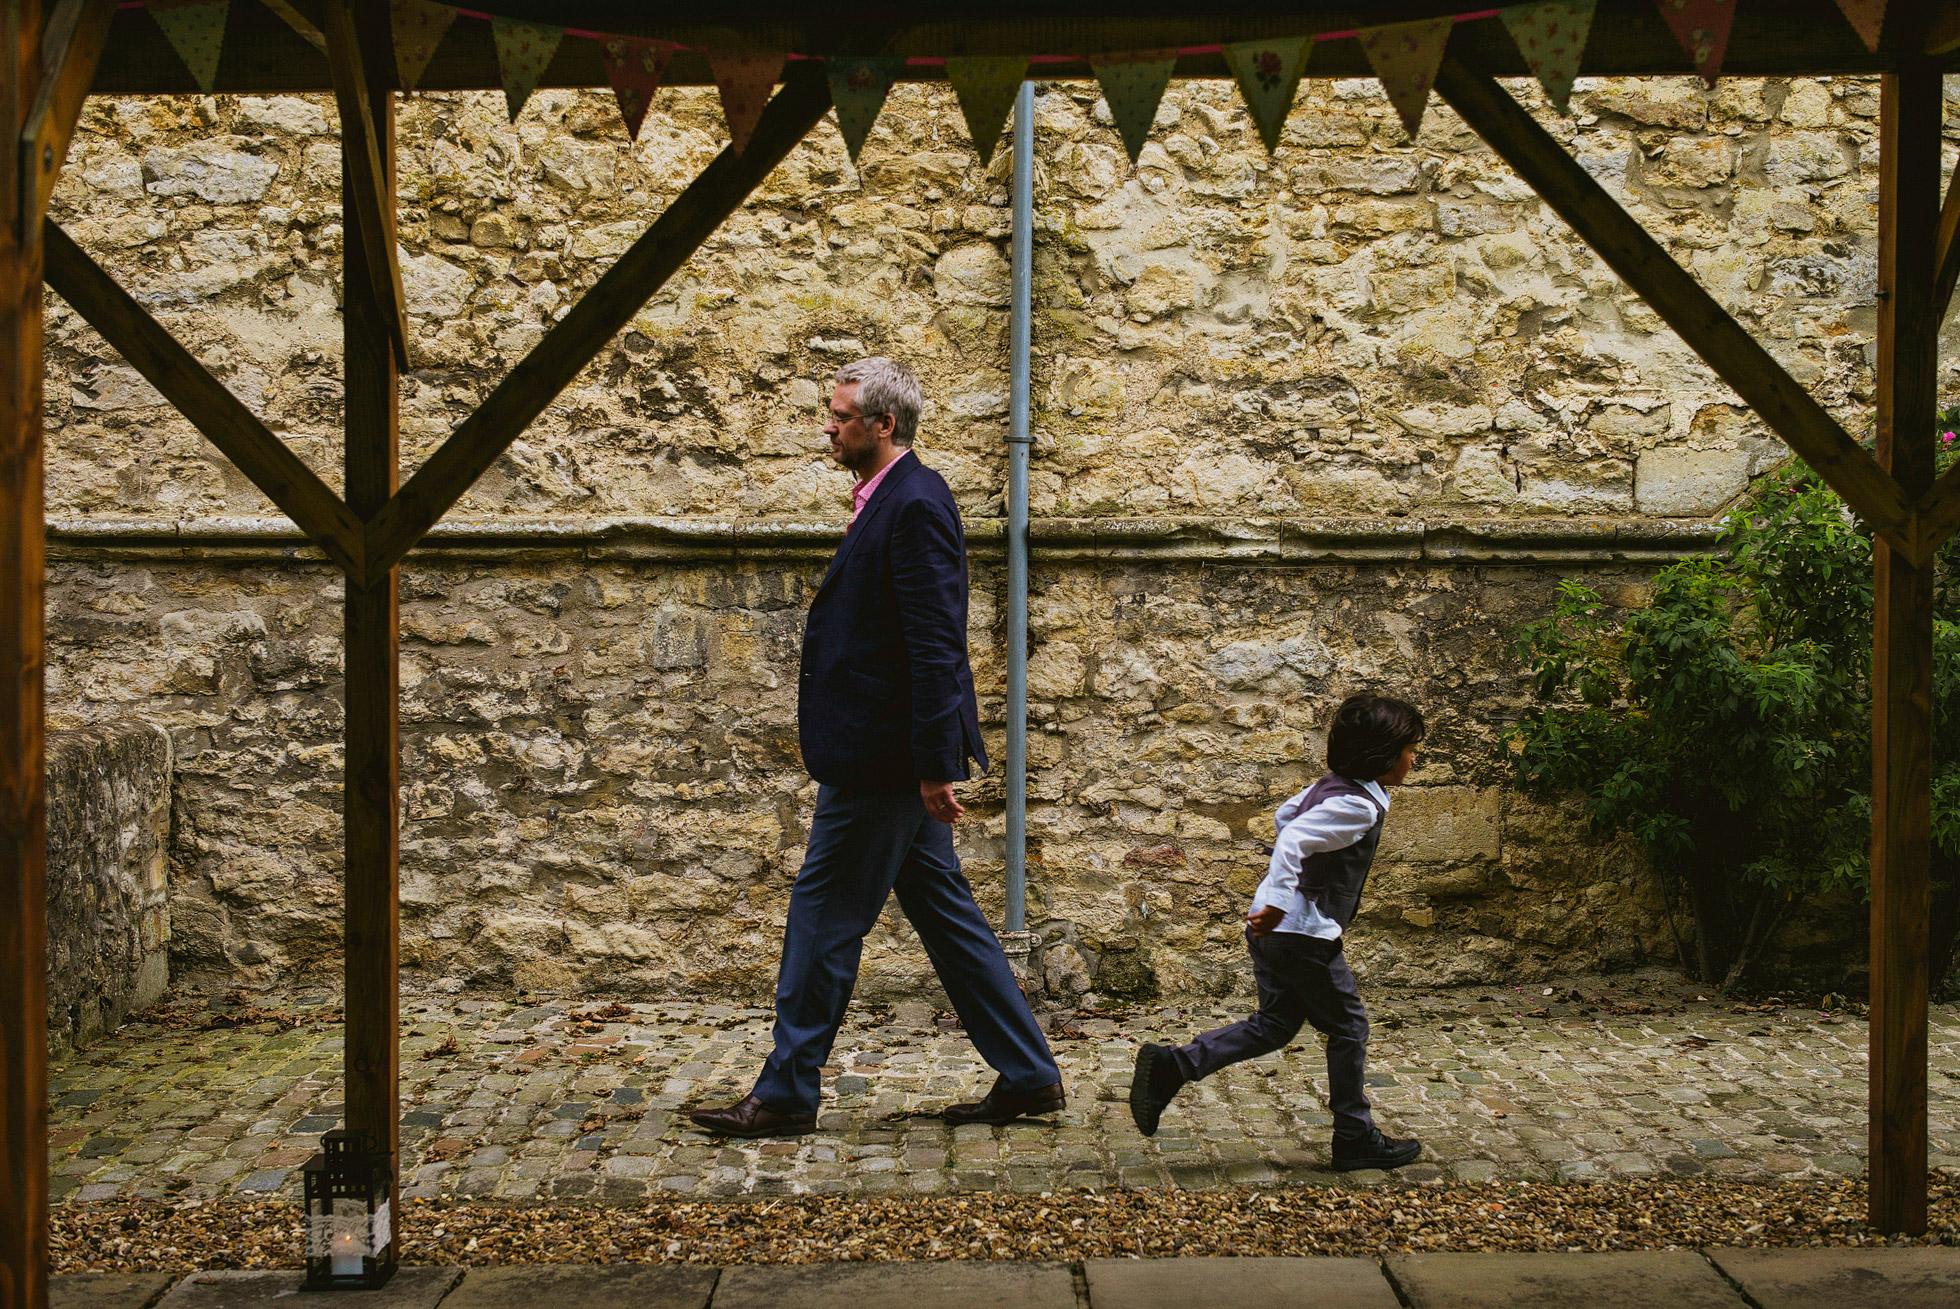 Notley Abbey Weddings in Oxfordshire